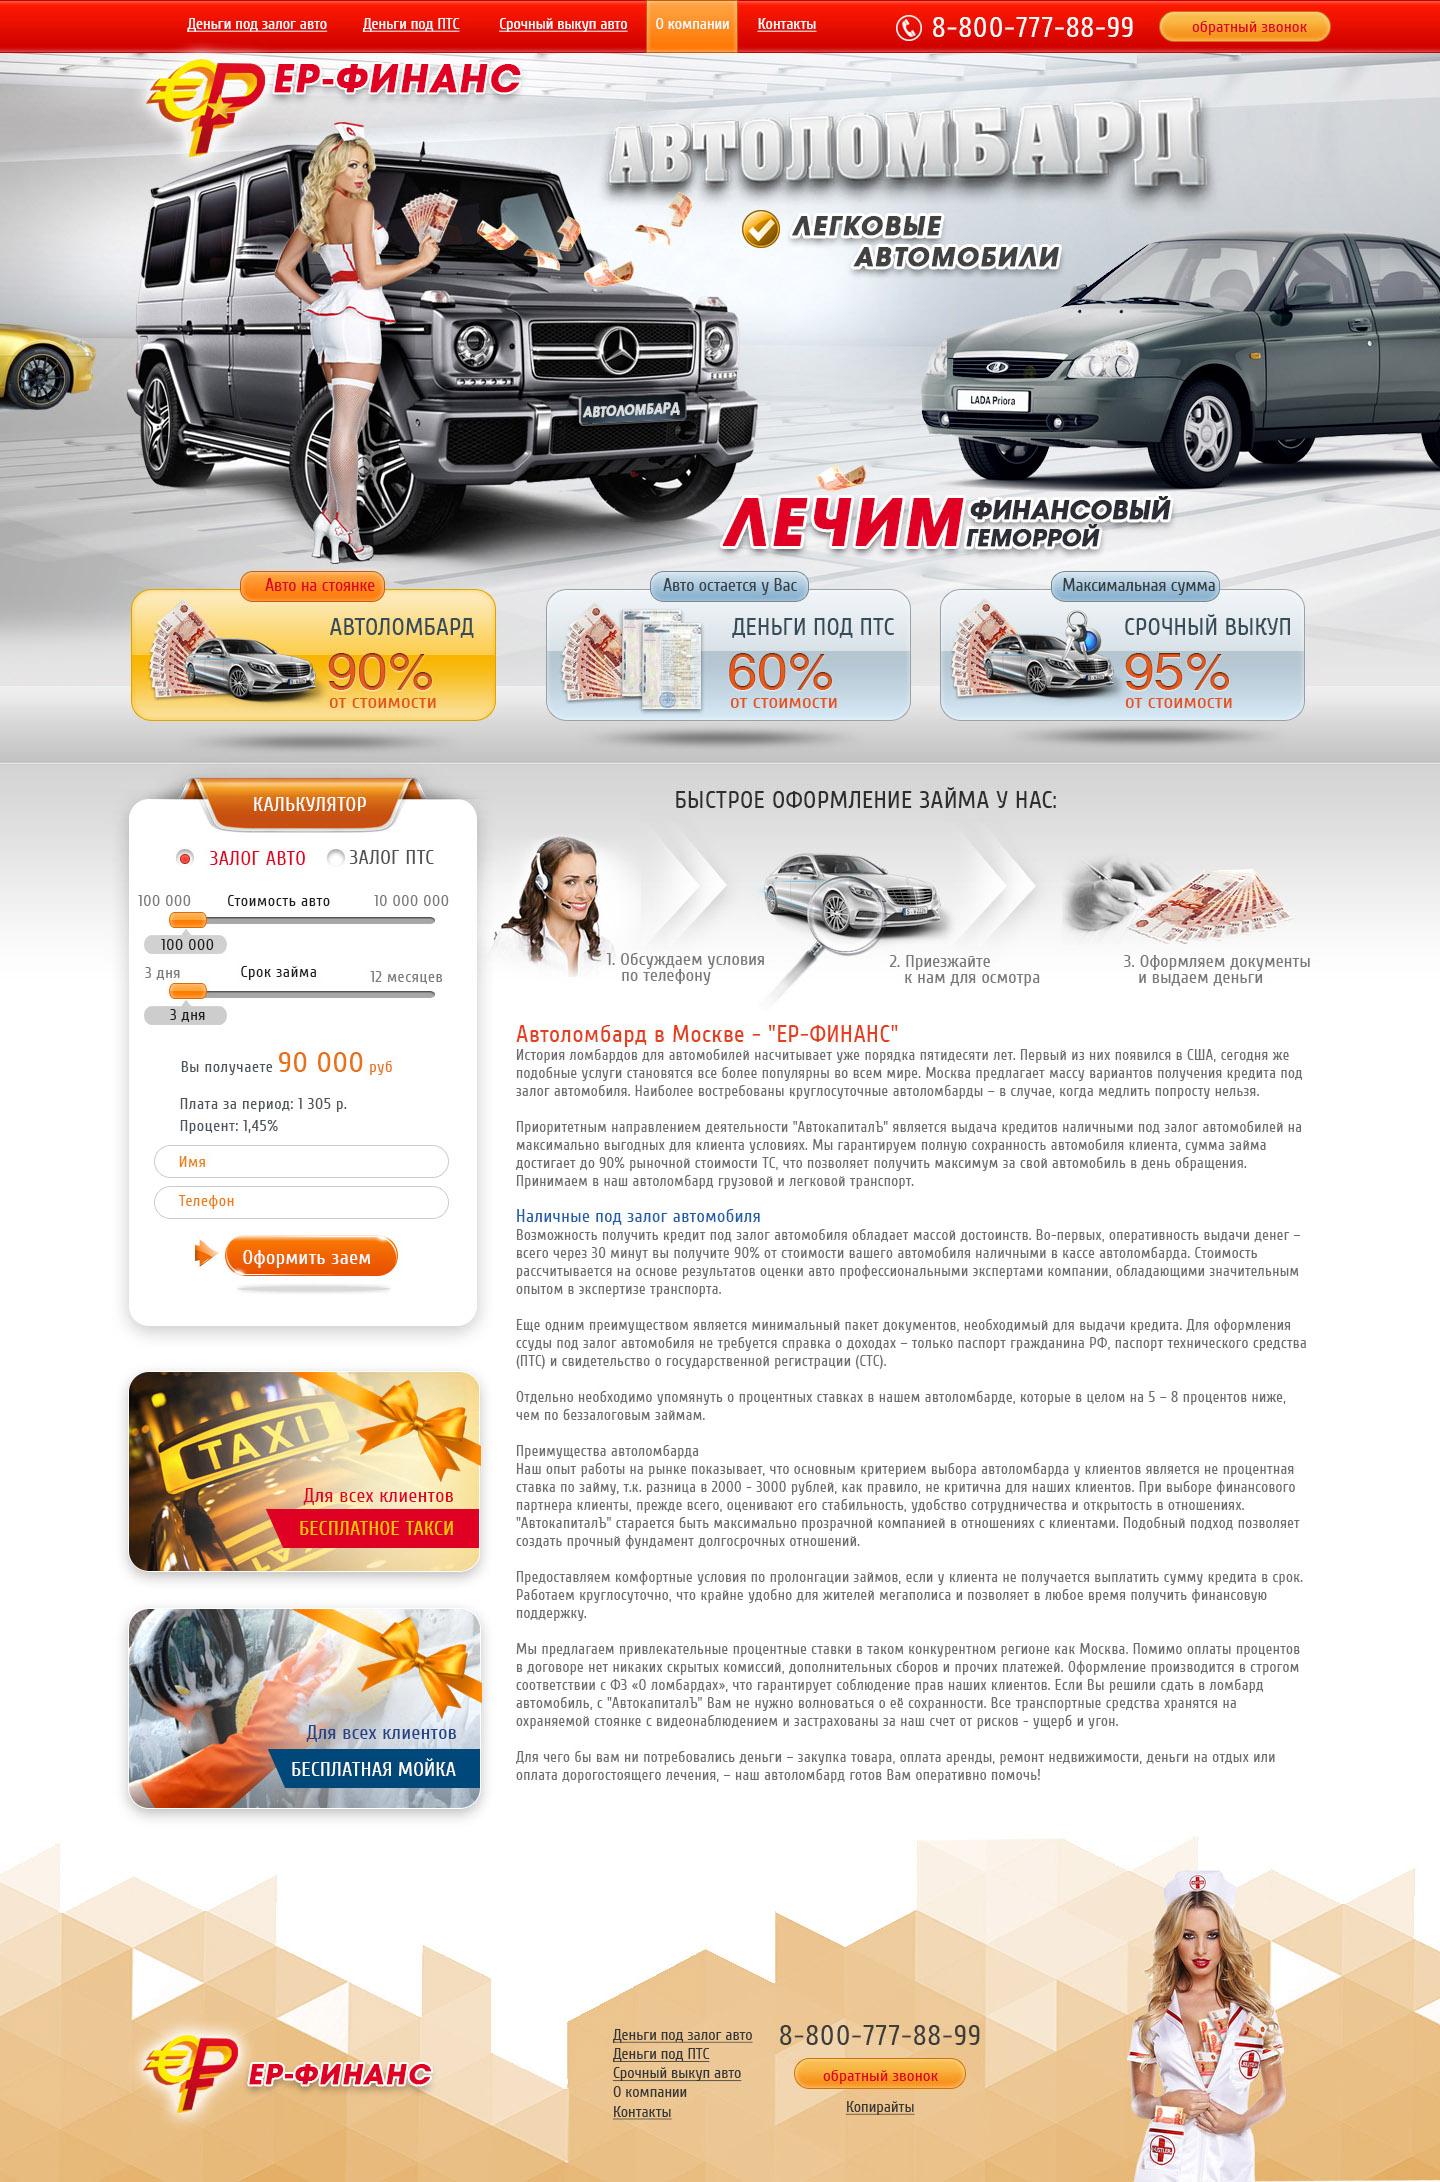 Дизайн сайта ЕР-финанс